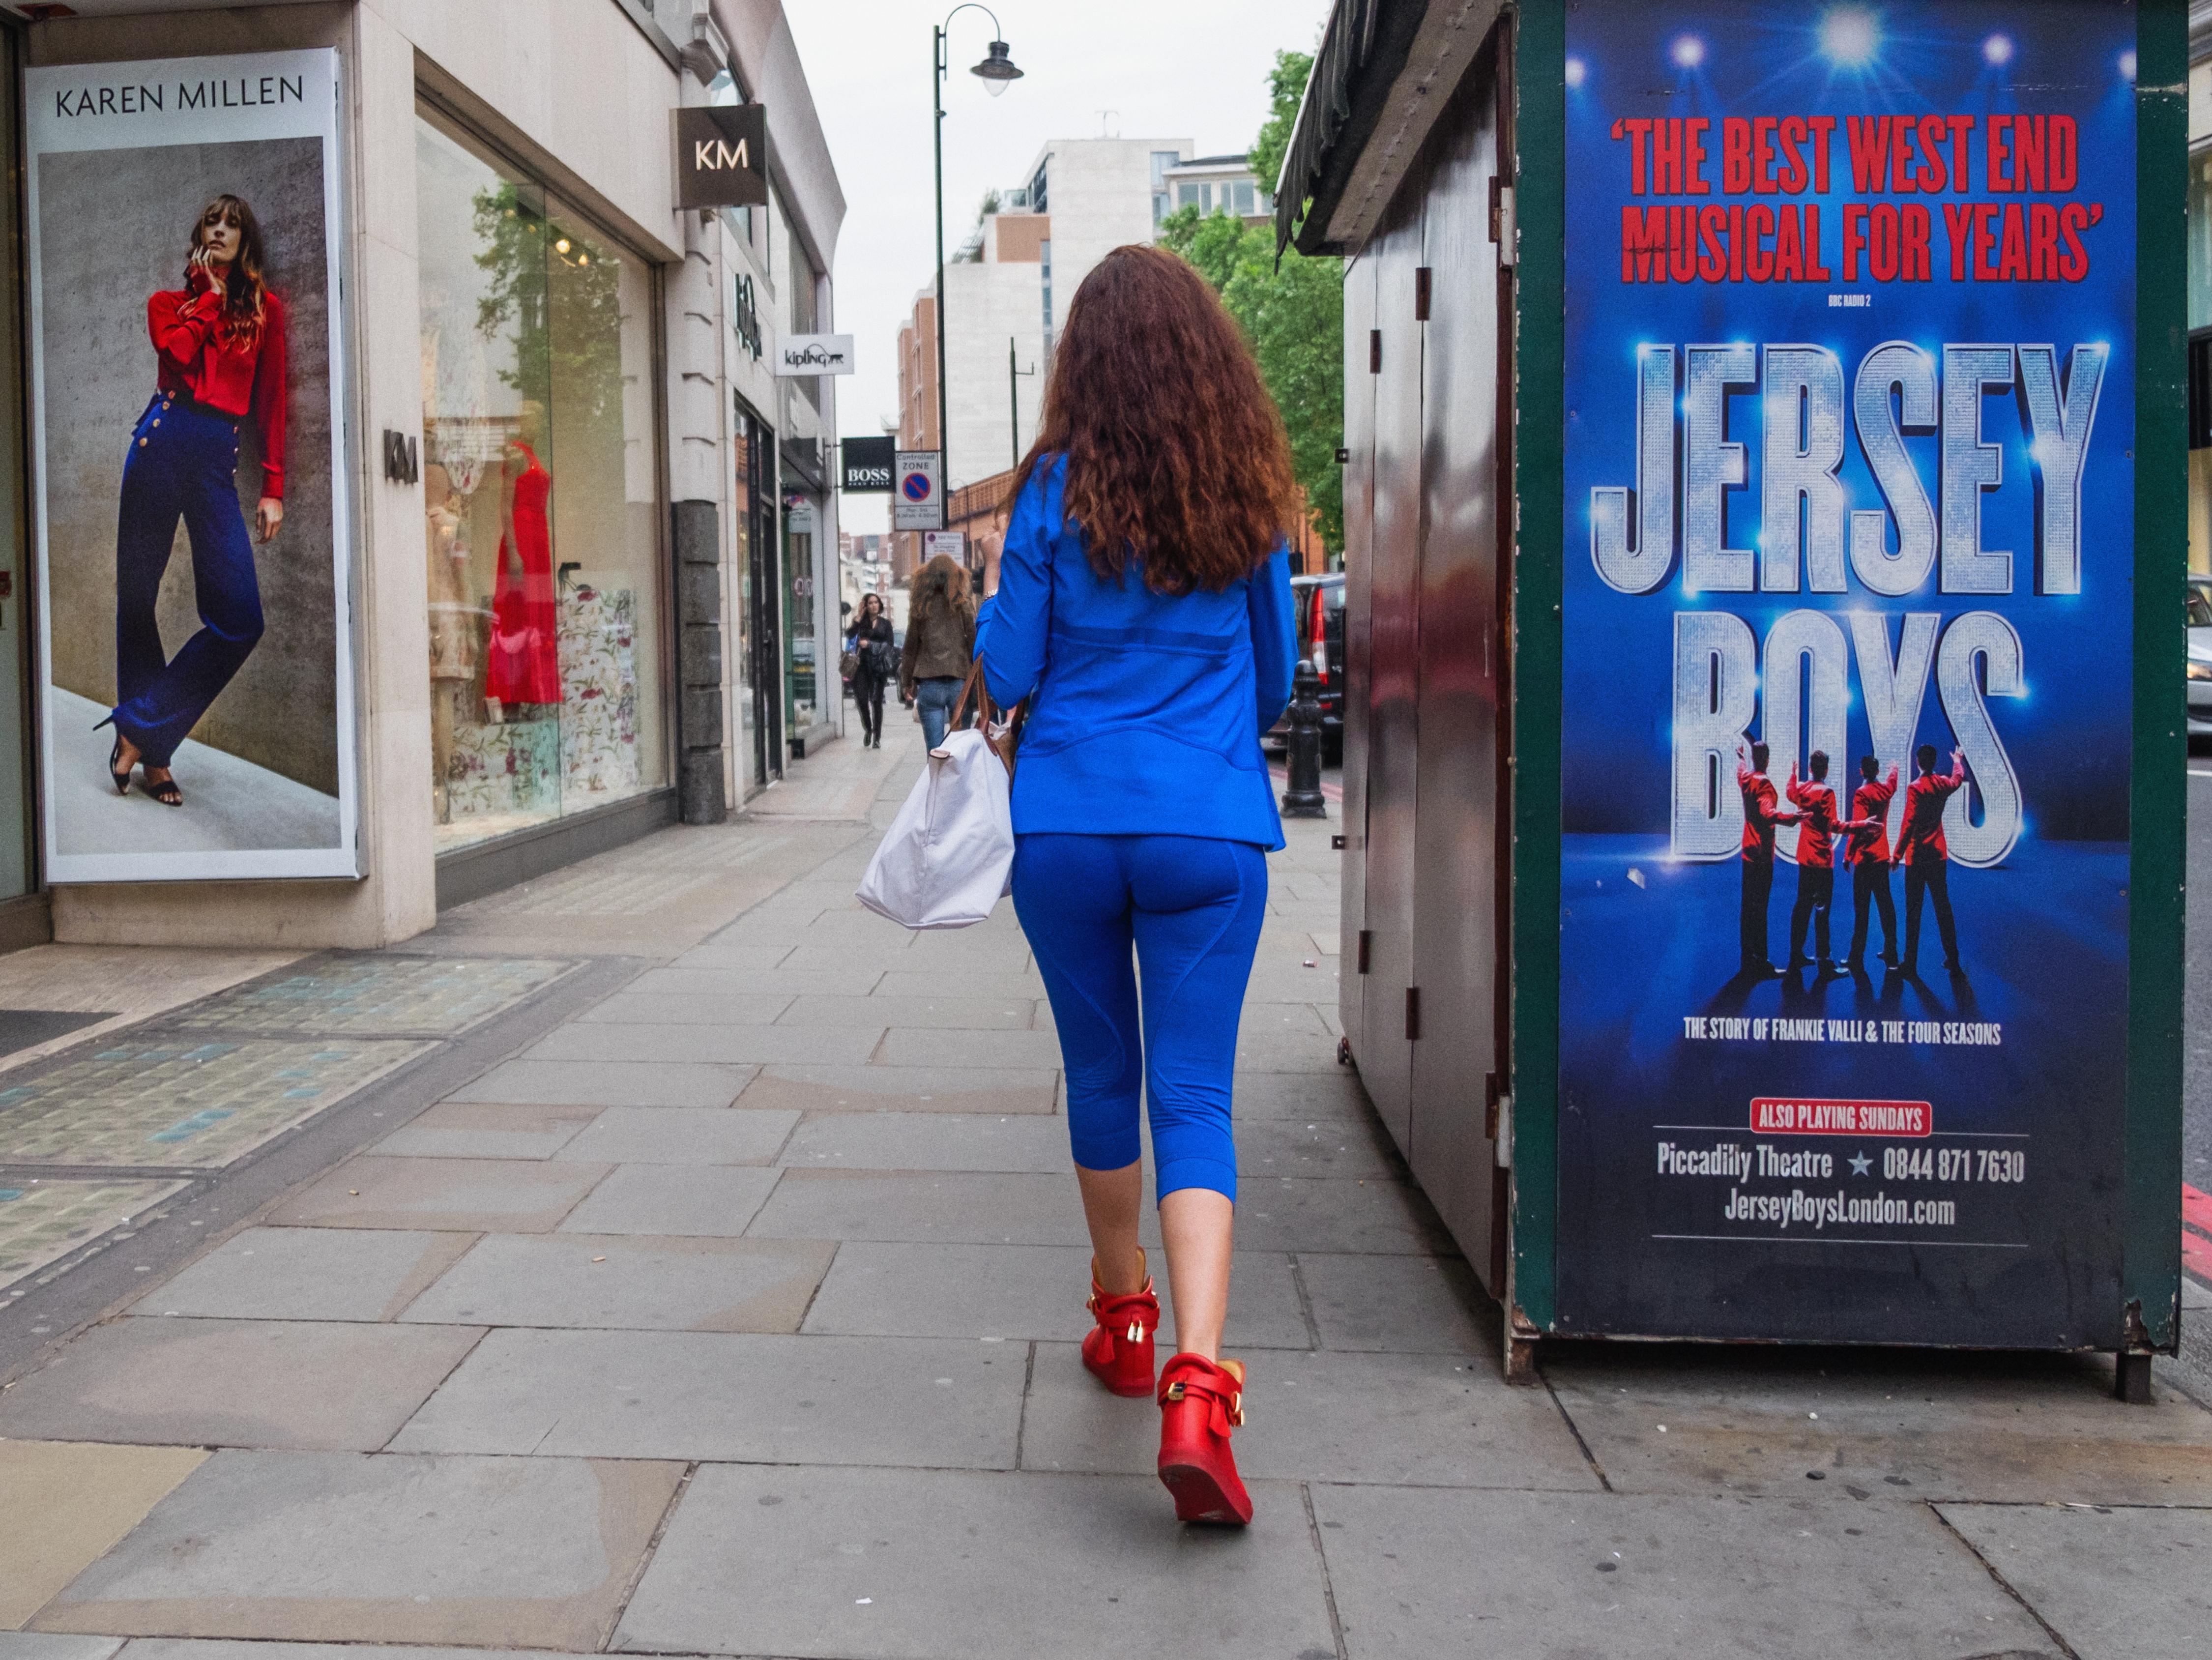 Jersey boys, Chelsea girl.